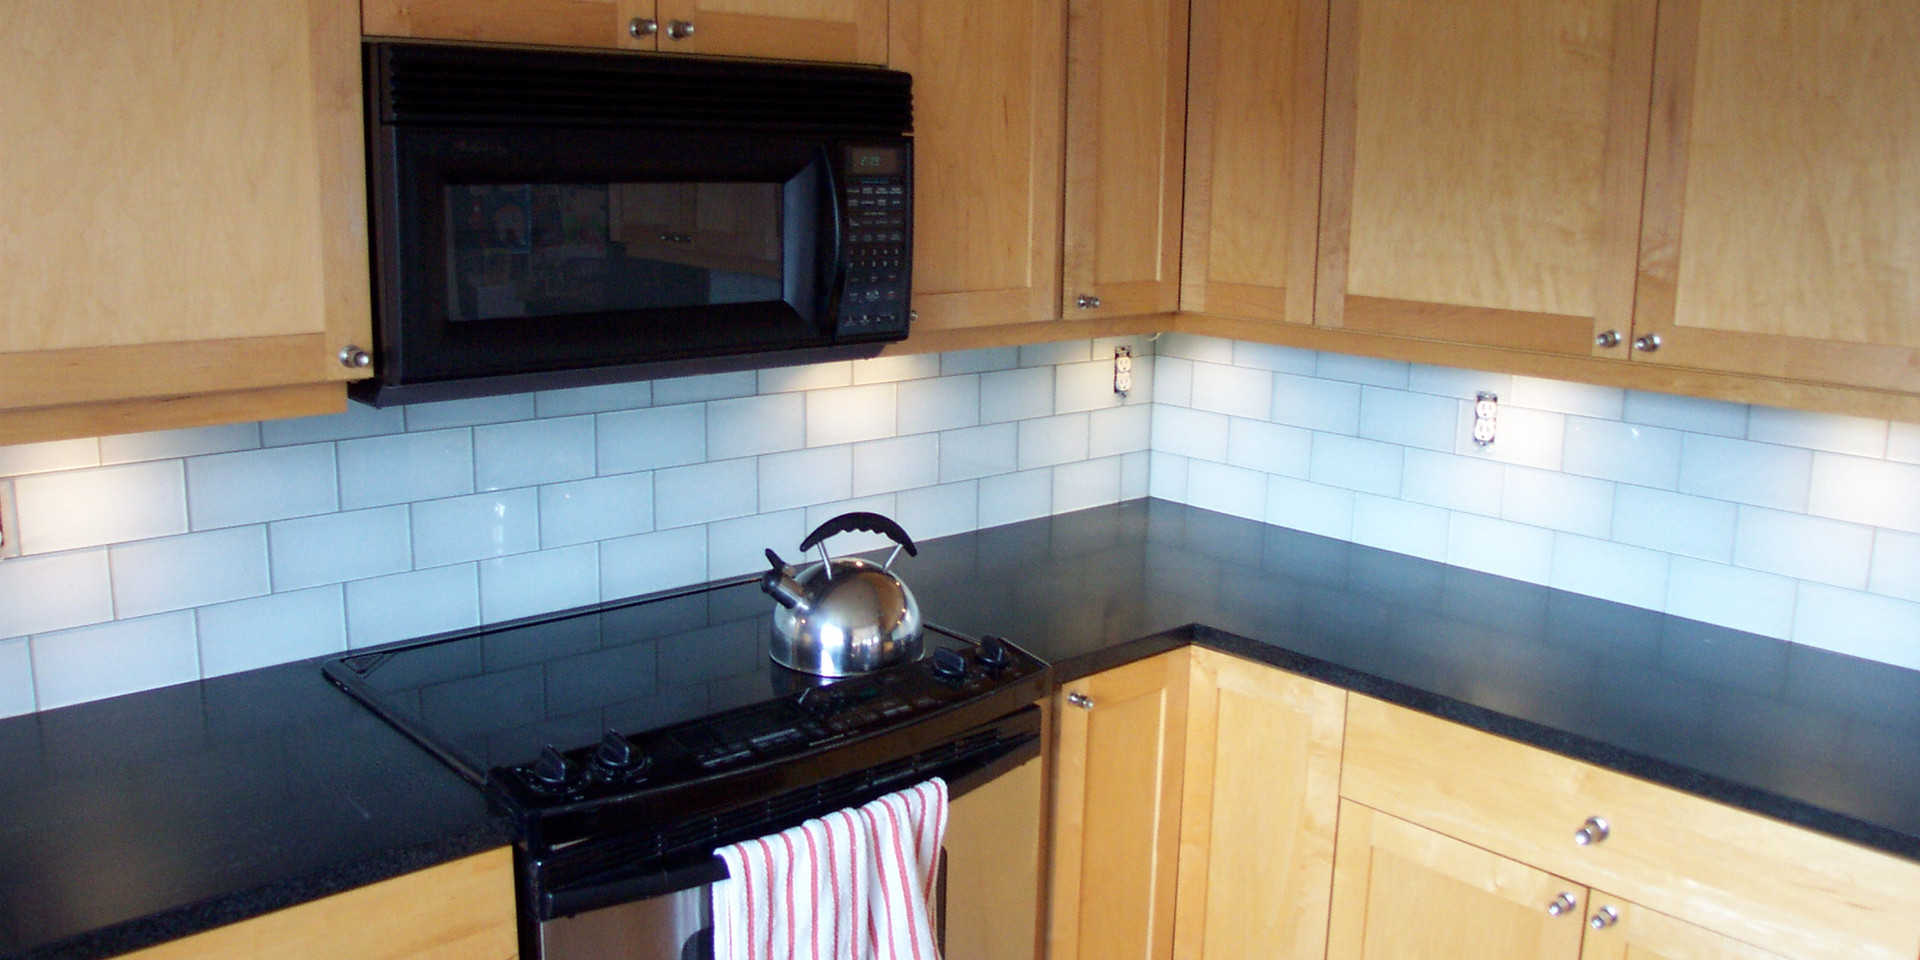 4x8 White Glass Tile